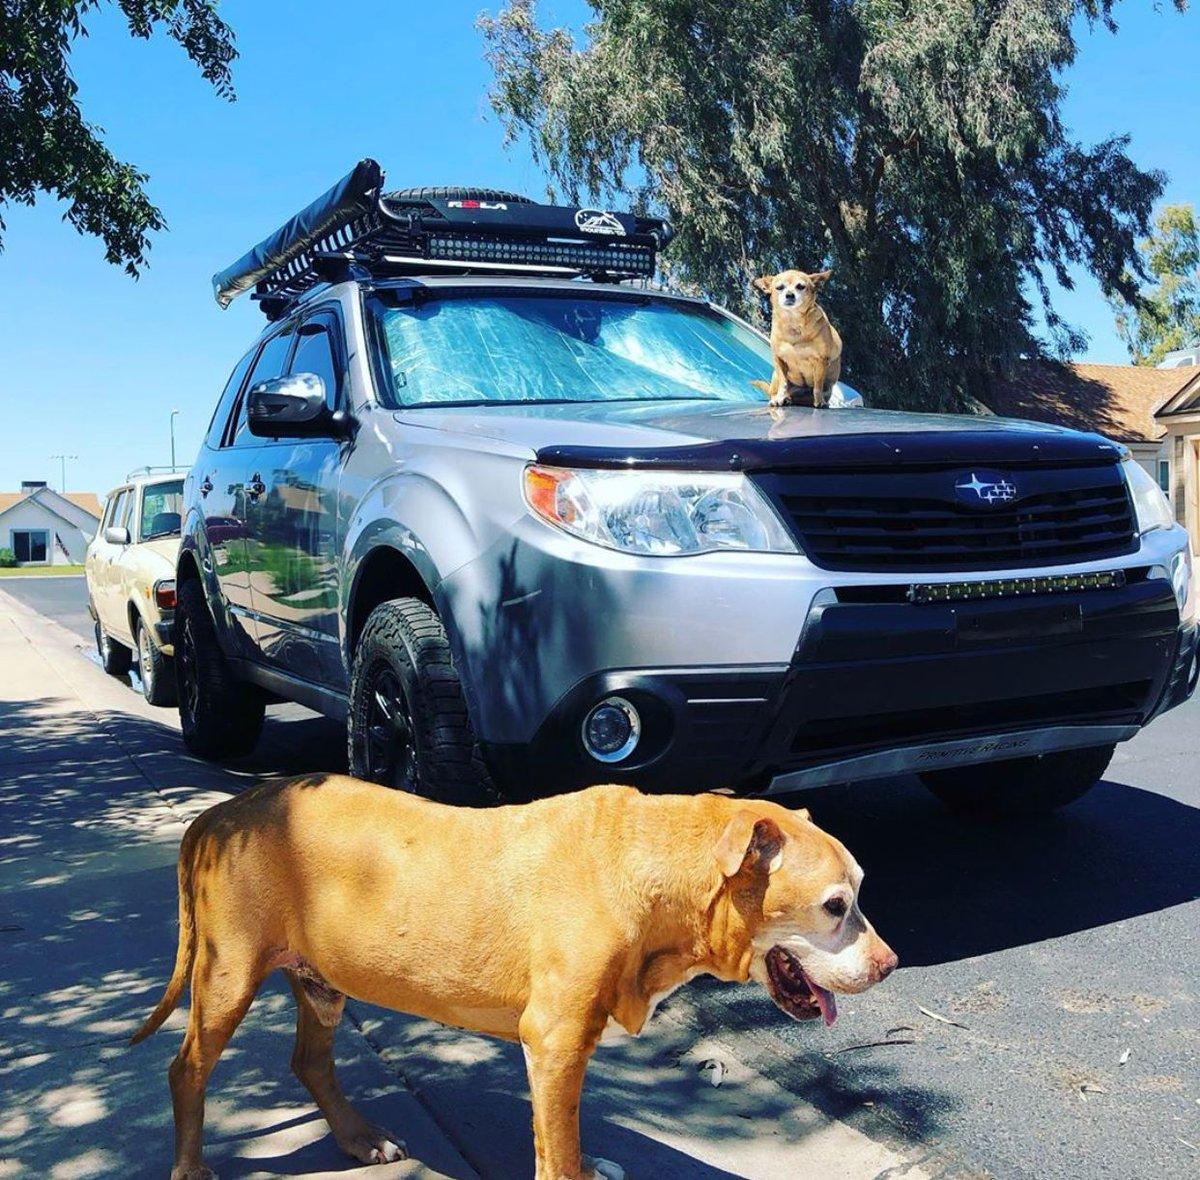 Wednesdays are for the pups  : @slo_foz   #Subaru #Subie #subieflow #subienation #subilove #HTX #houston #houstontx #texas #carsales #cars #carsforsale #autosales #car #cardealership #subaruambassadorspic.twitter.com/bYyVSgVUs8